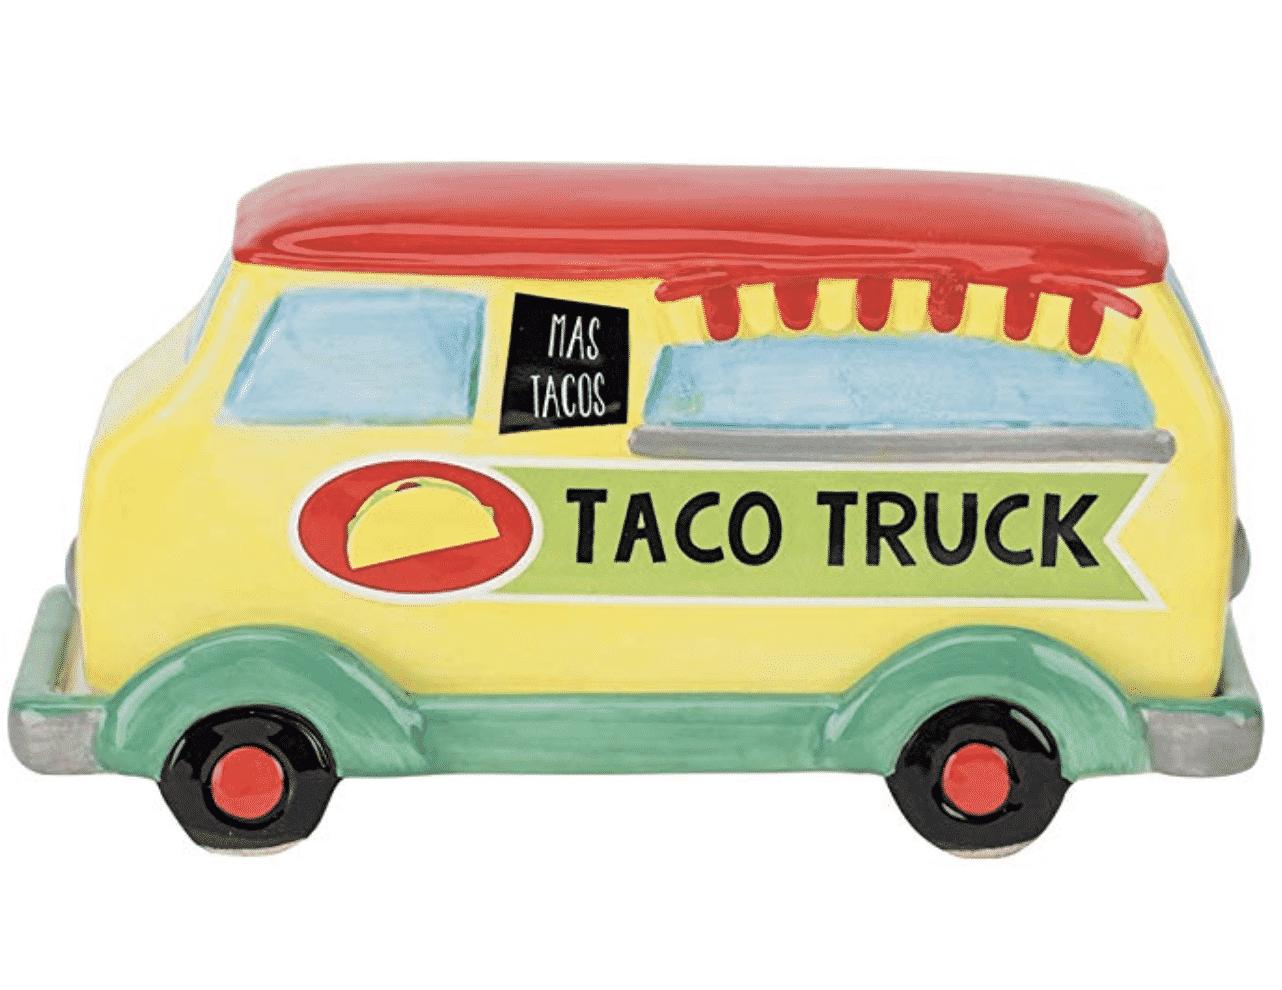 butter-dish-taco-truck